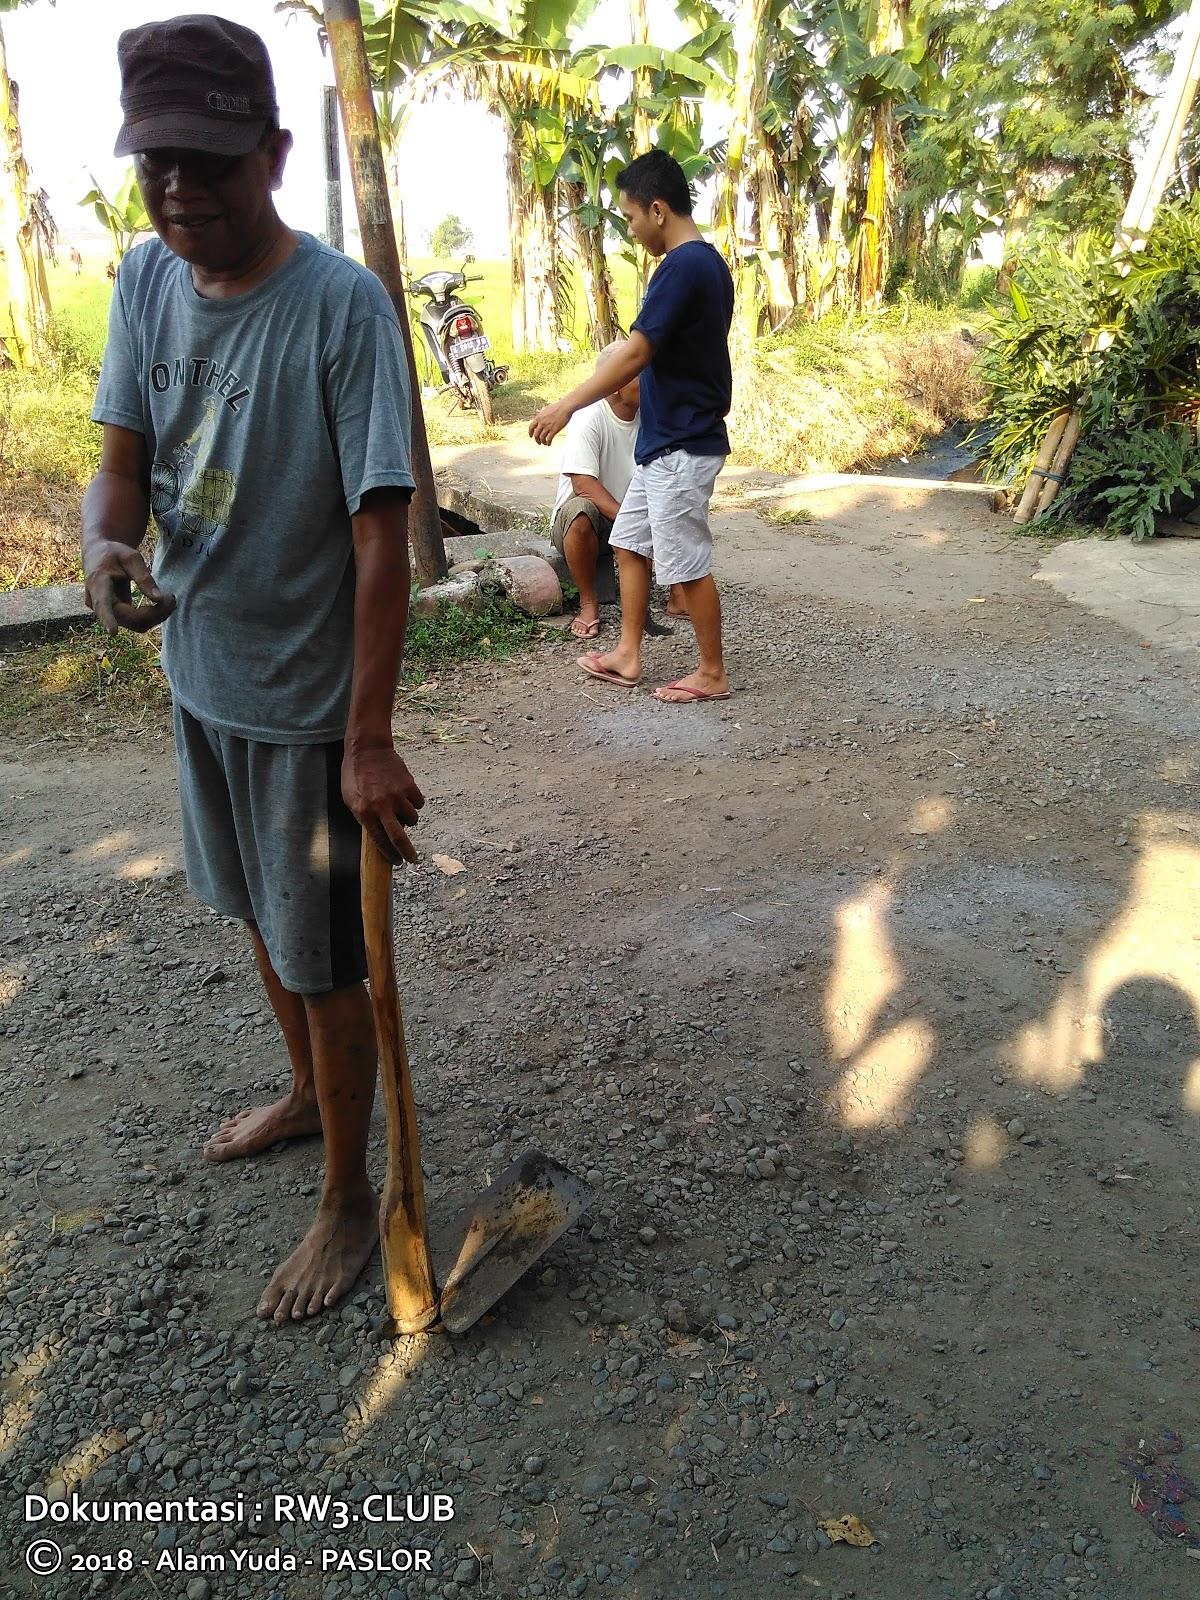 Danda Ade Prastya, Suliyanto - Kerja Bakti RW-3 Pasuruhan Lor, Kudus